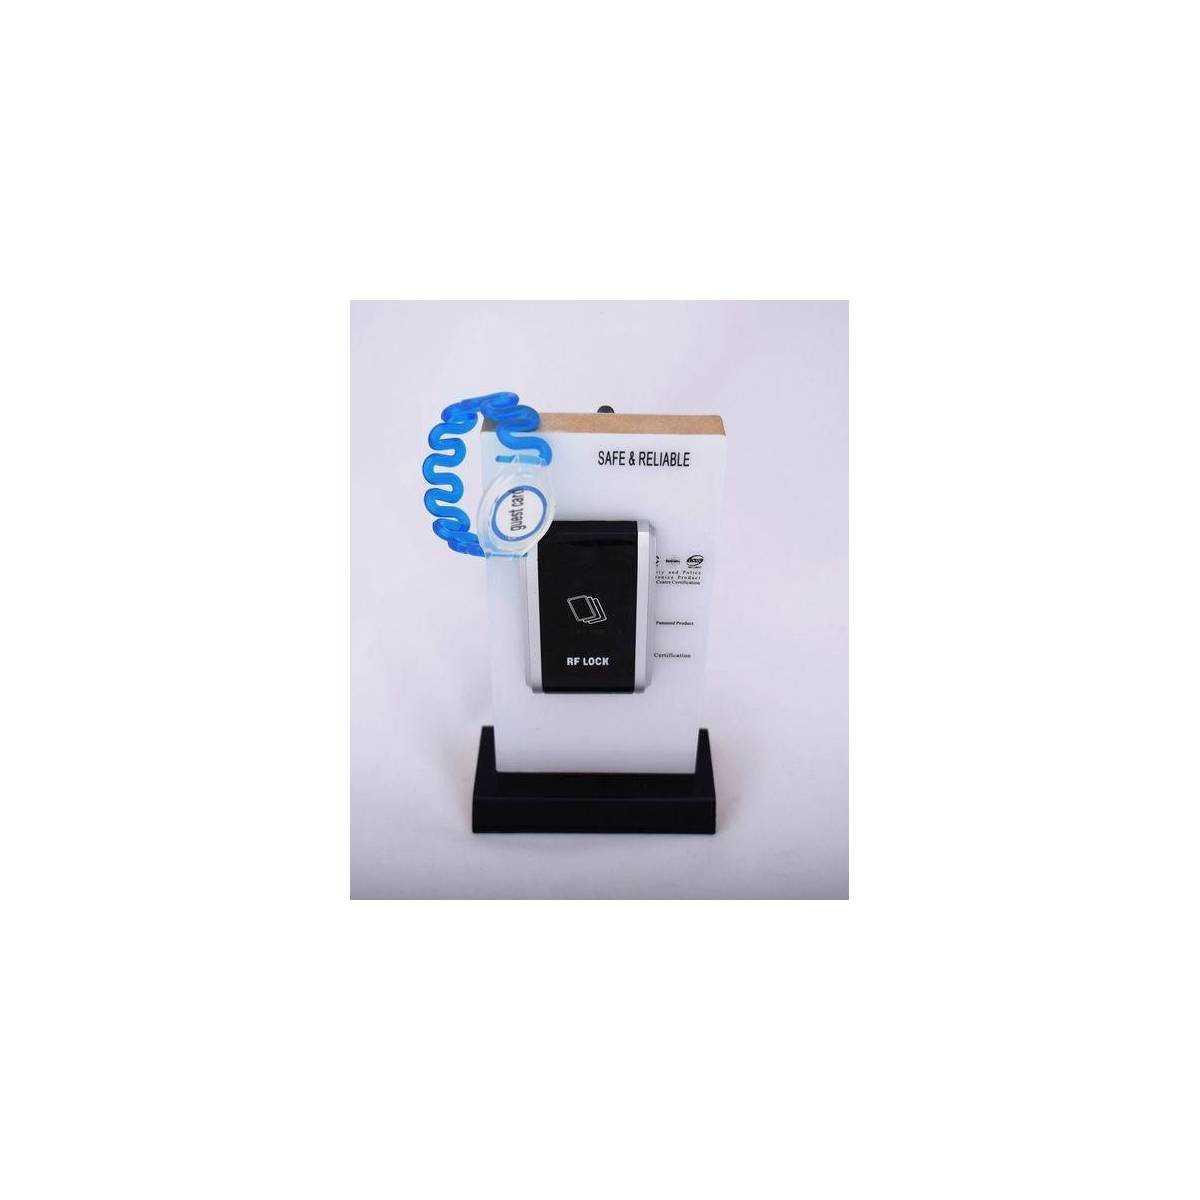 Мебельный электронный замок INV08SS SR08